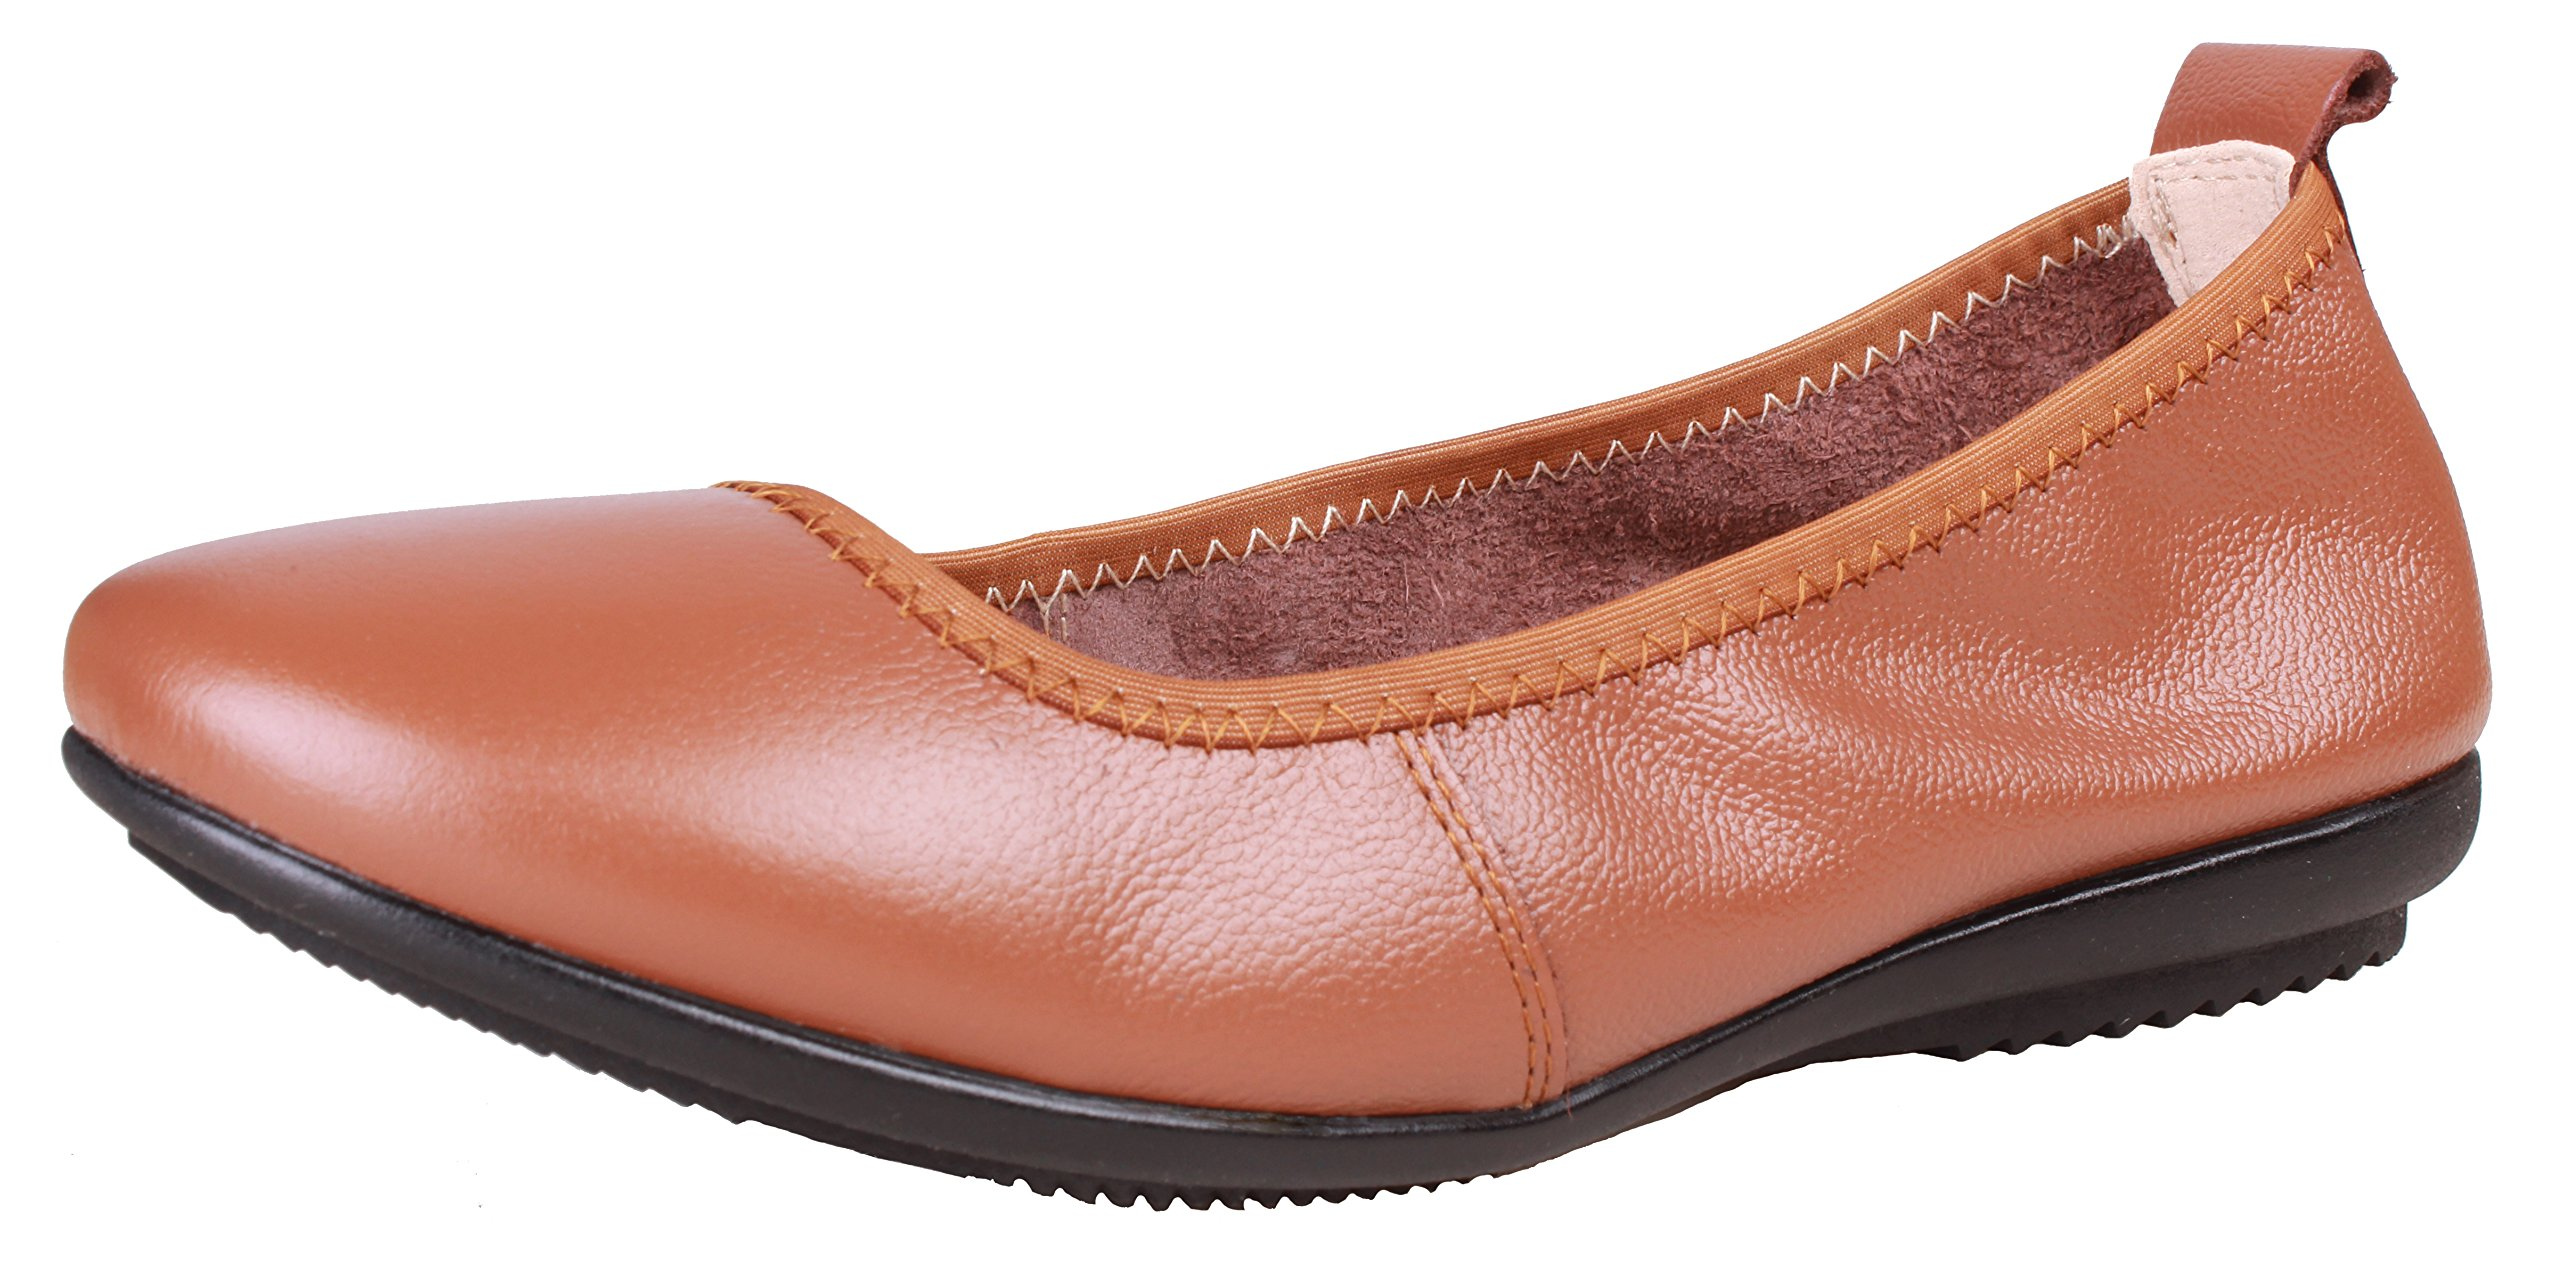 Kunsto Women's Comfort Leather Ballet Flats Shoes US Size 9 Brown